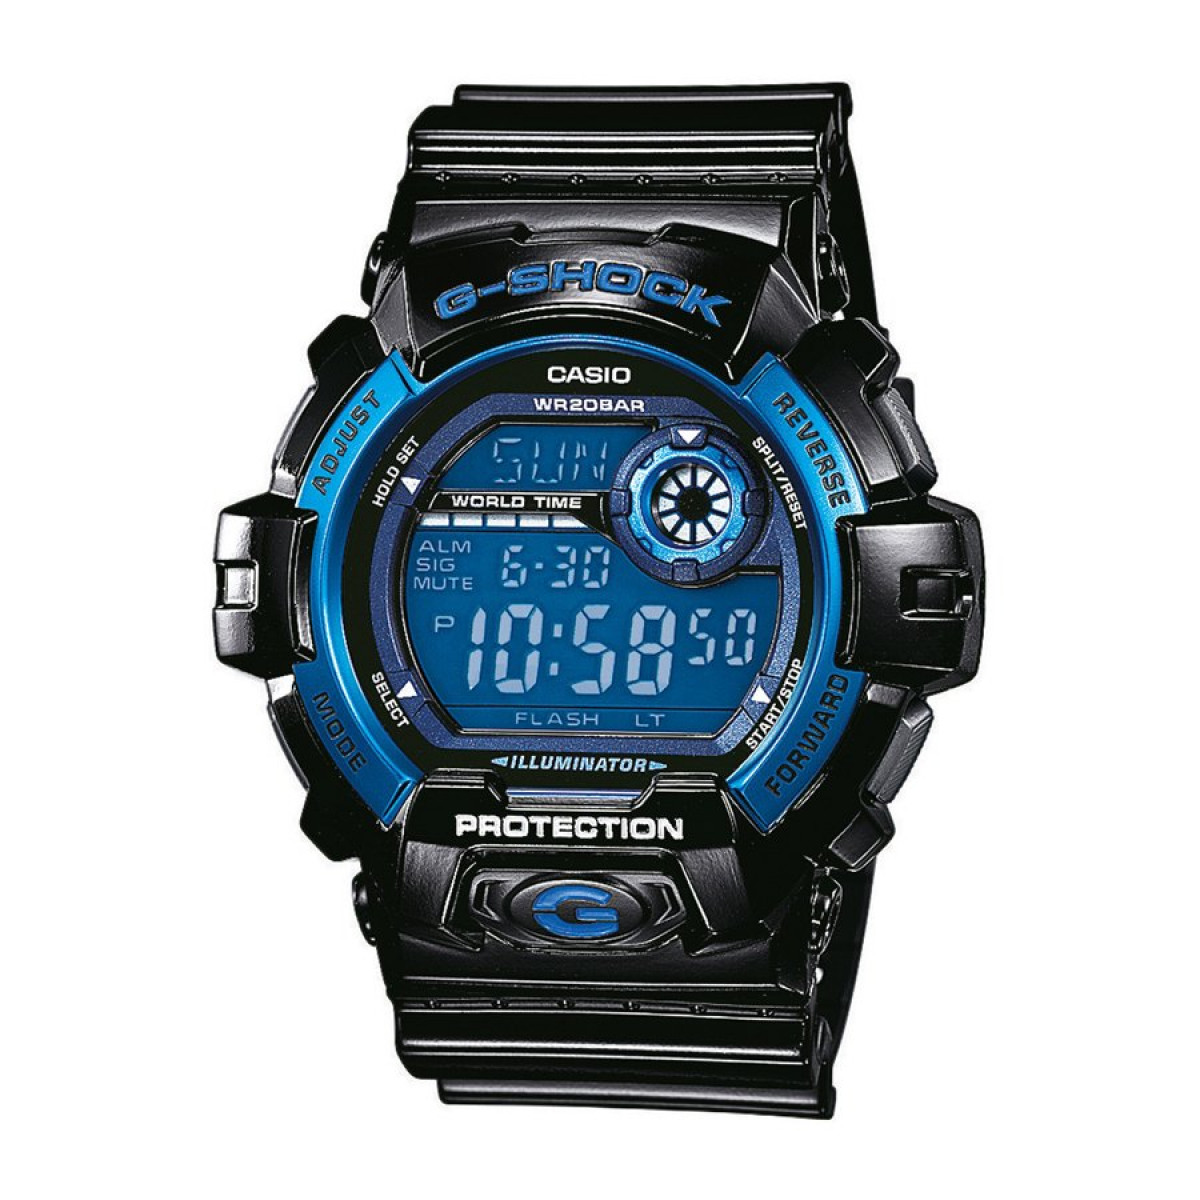 Часовник Casio G-Shock G-8900A-1ER